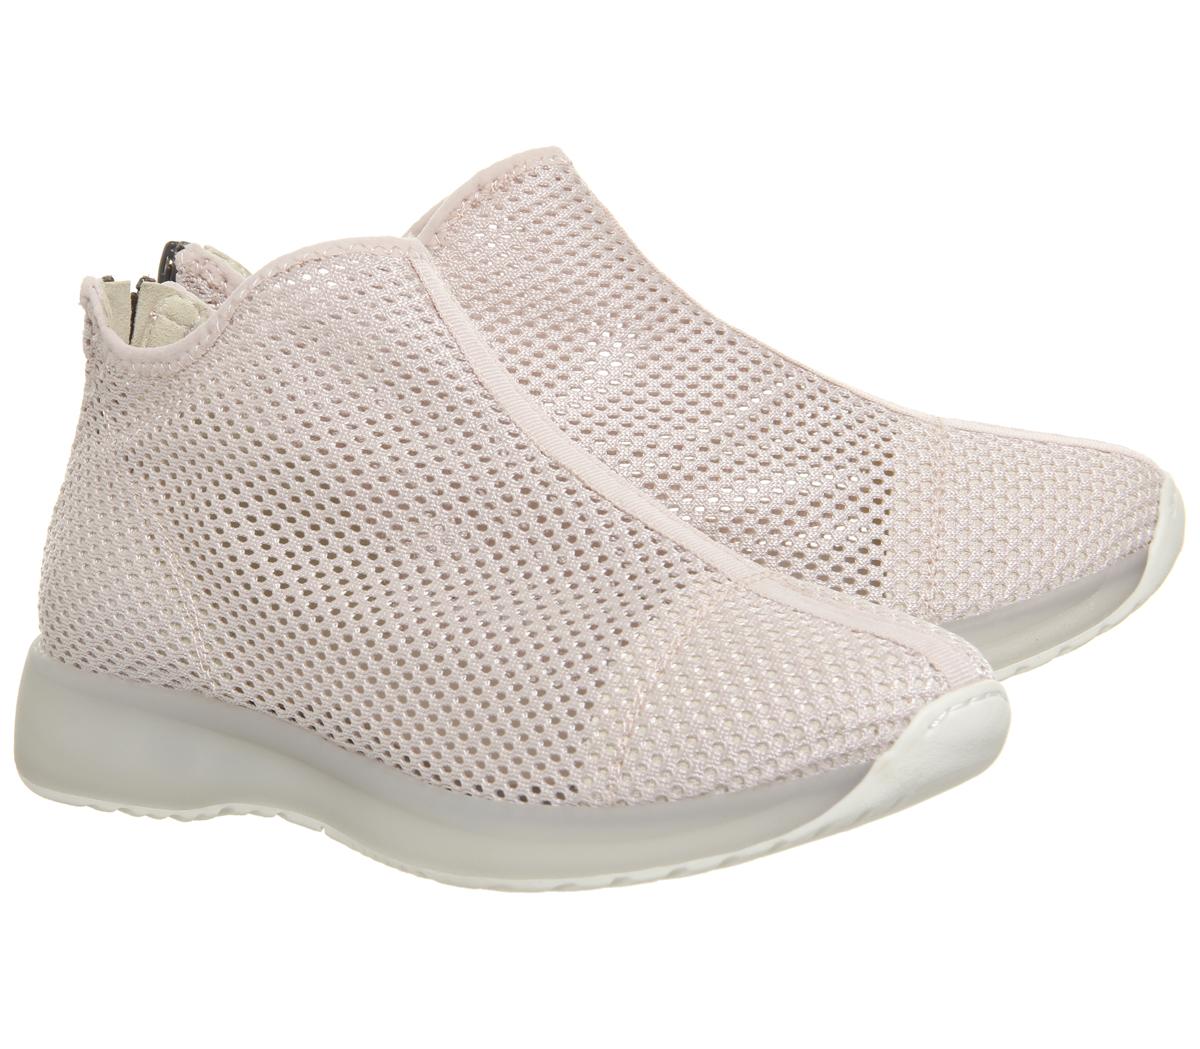 Womens Vagabond Cintia Mesh Trainers Shoes MILKSHAKE Trainers Shoes Trainers dcedc1